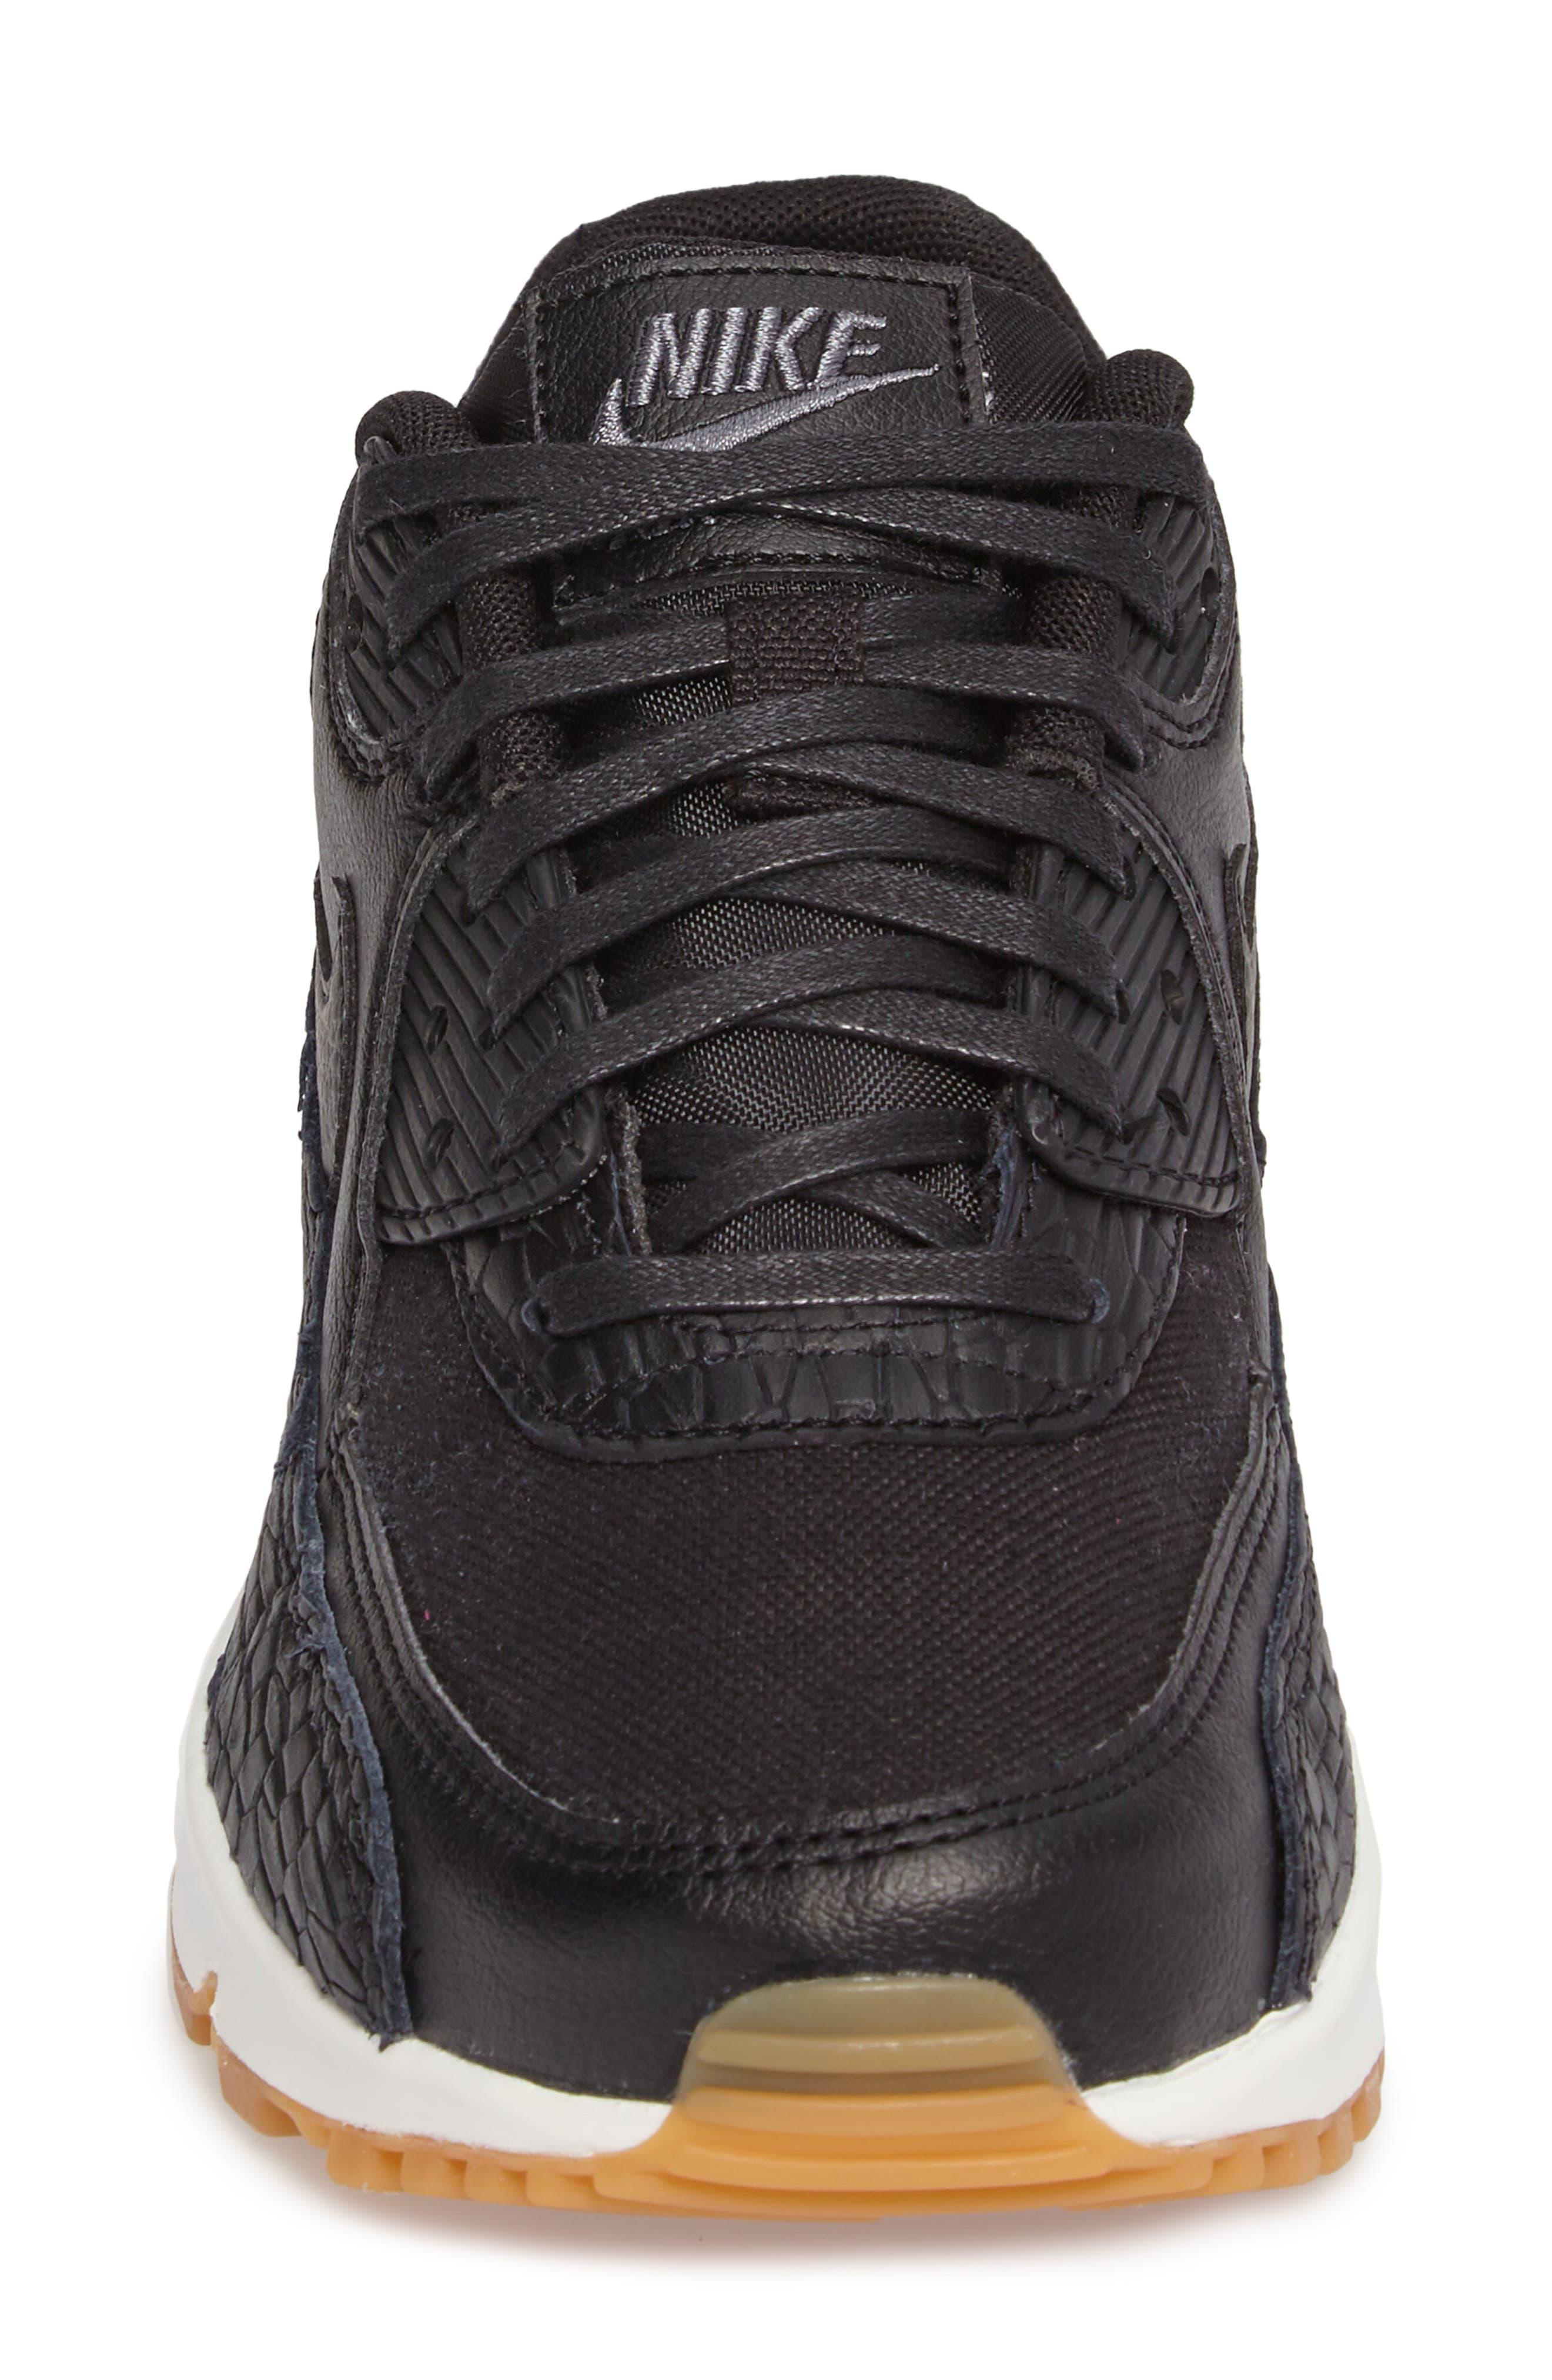 Air Max 90 Premium Leather Sneaker,                             Alternate thumbnail 4, color,                             Black/ Dark Grey/ Ivory